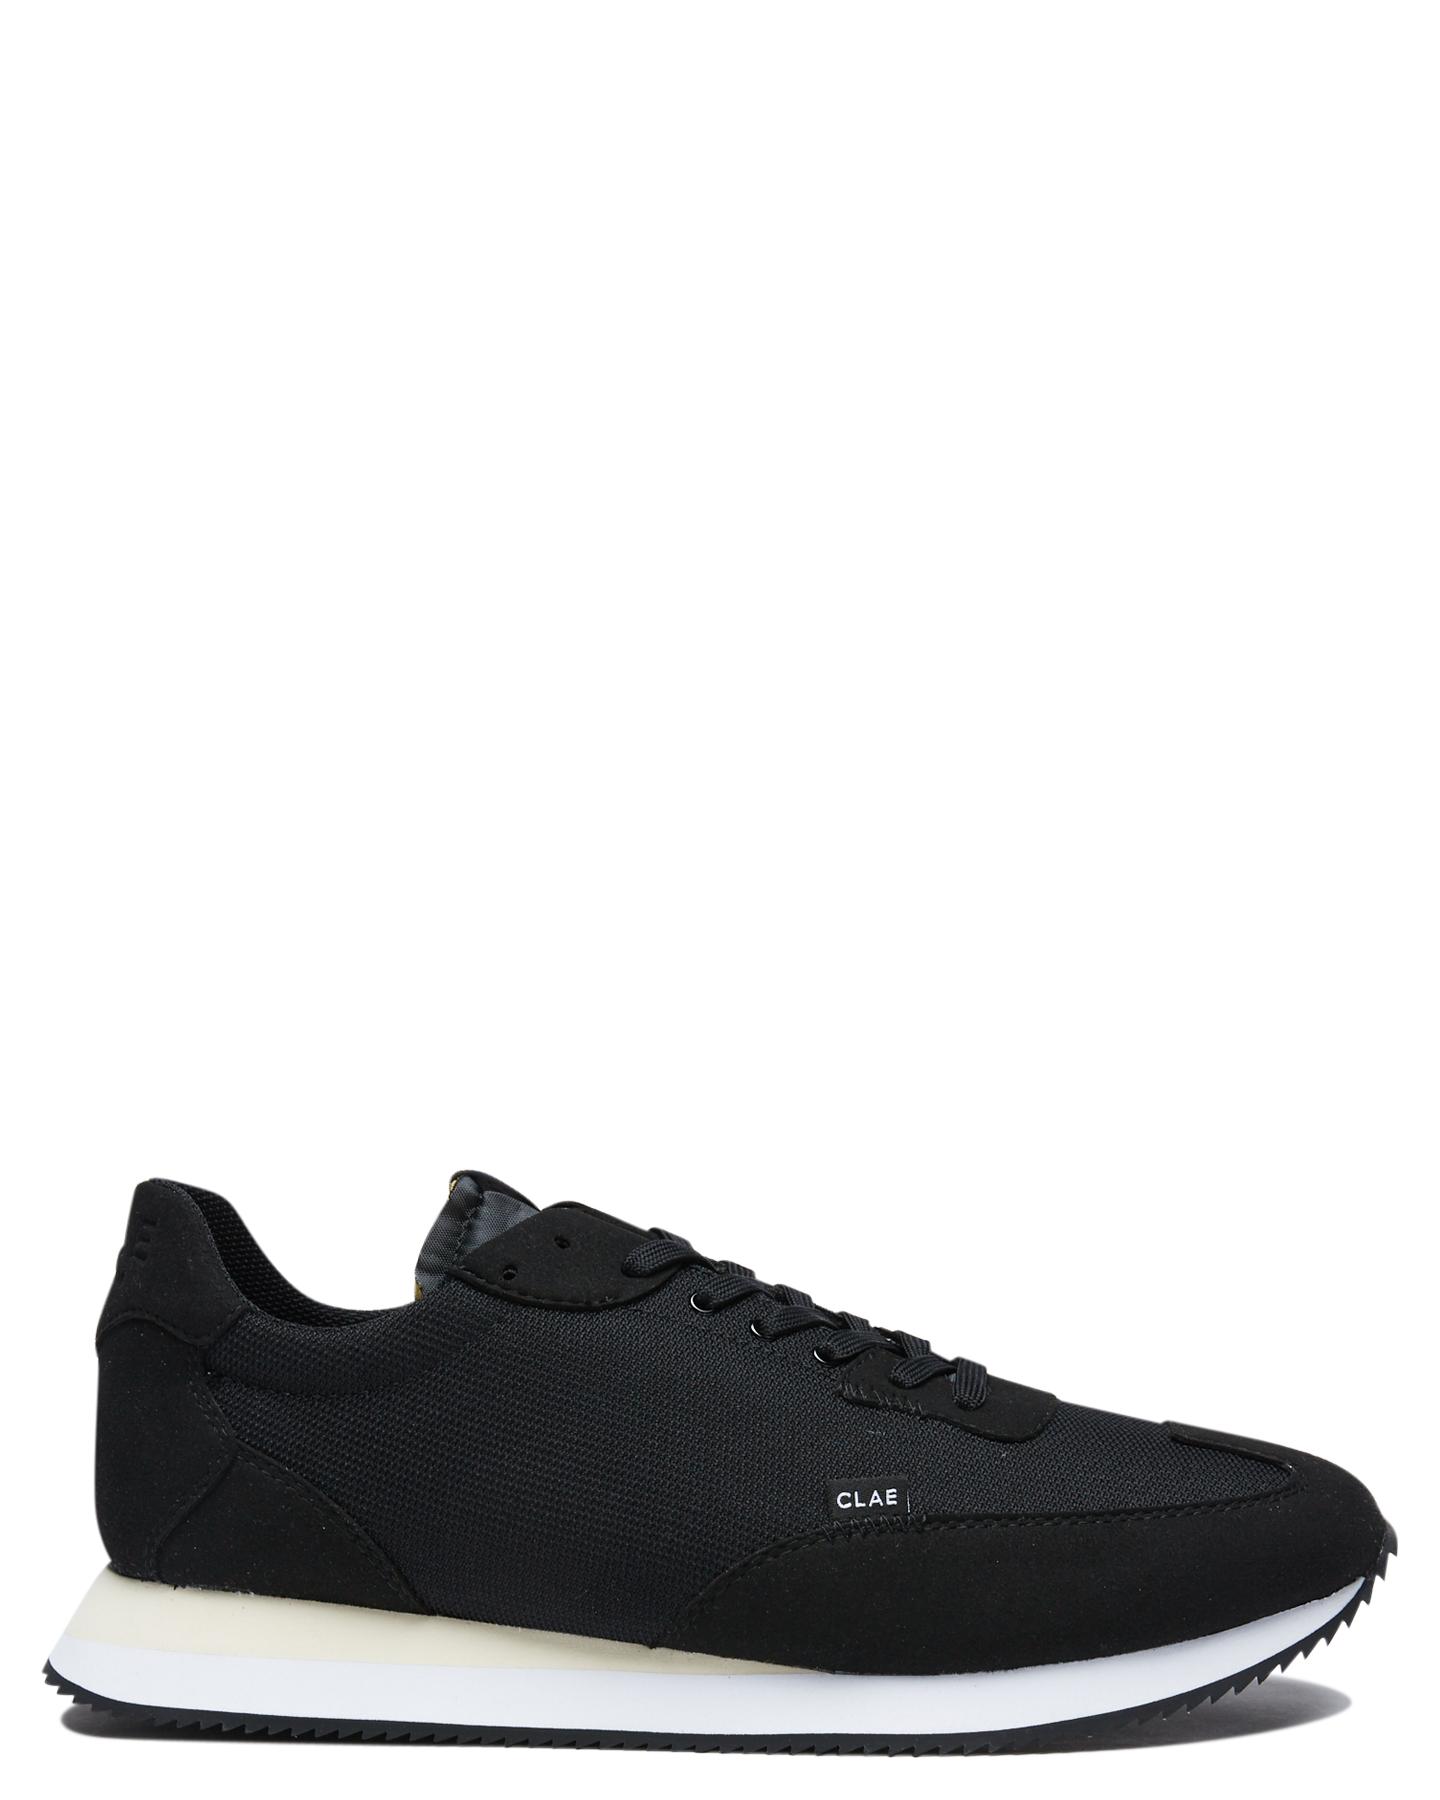 Clae Runyon Mens Sneaker Black White